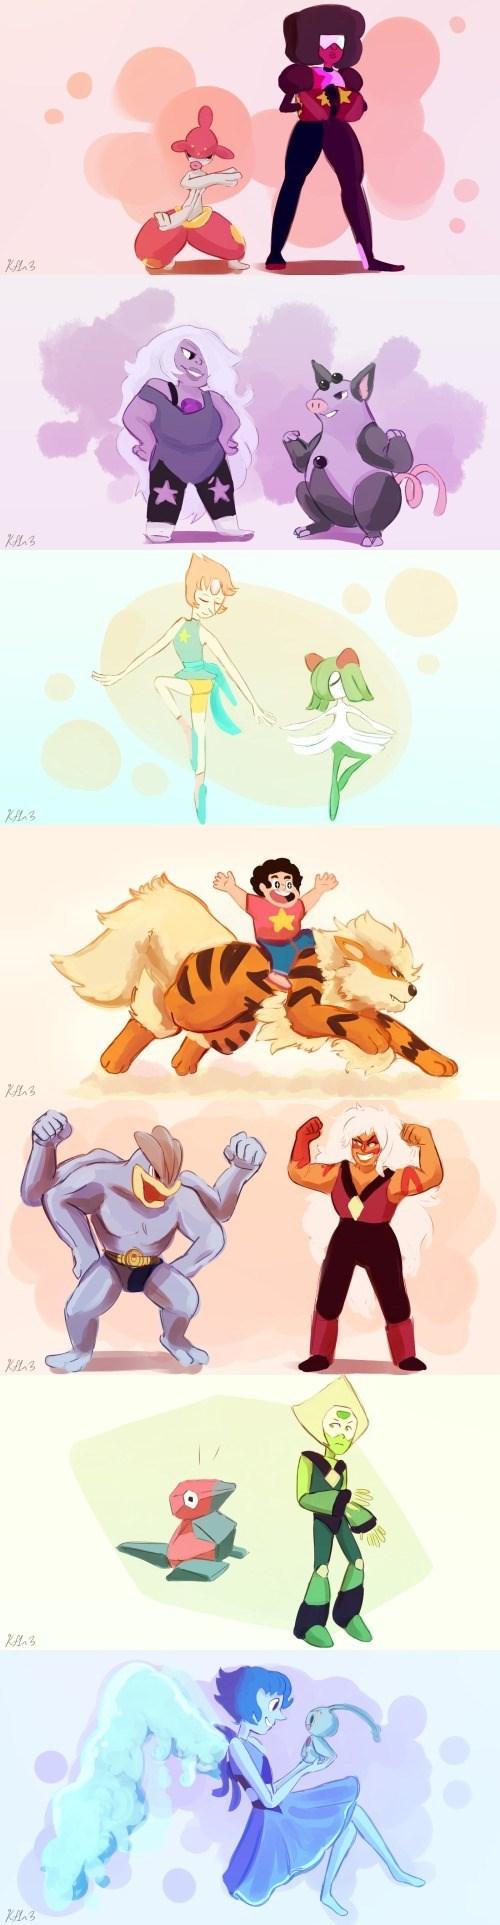 pokemon memes steven universe trainers crossover